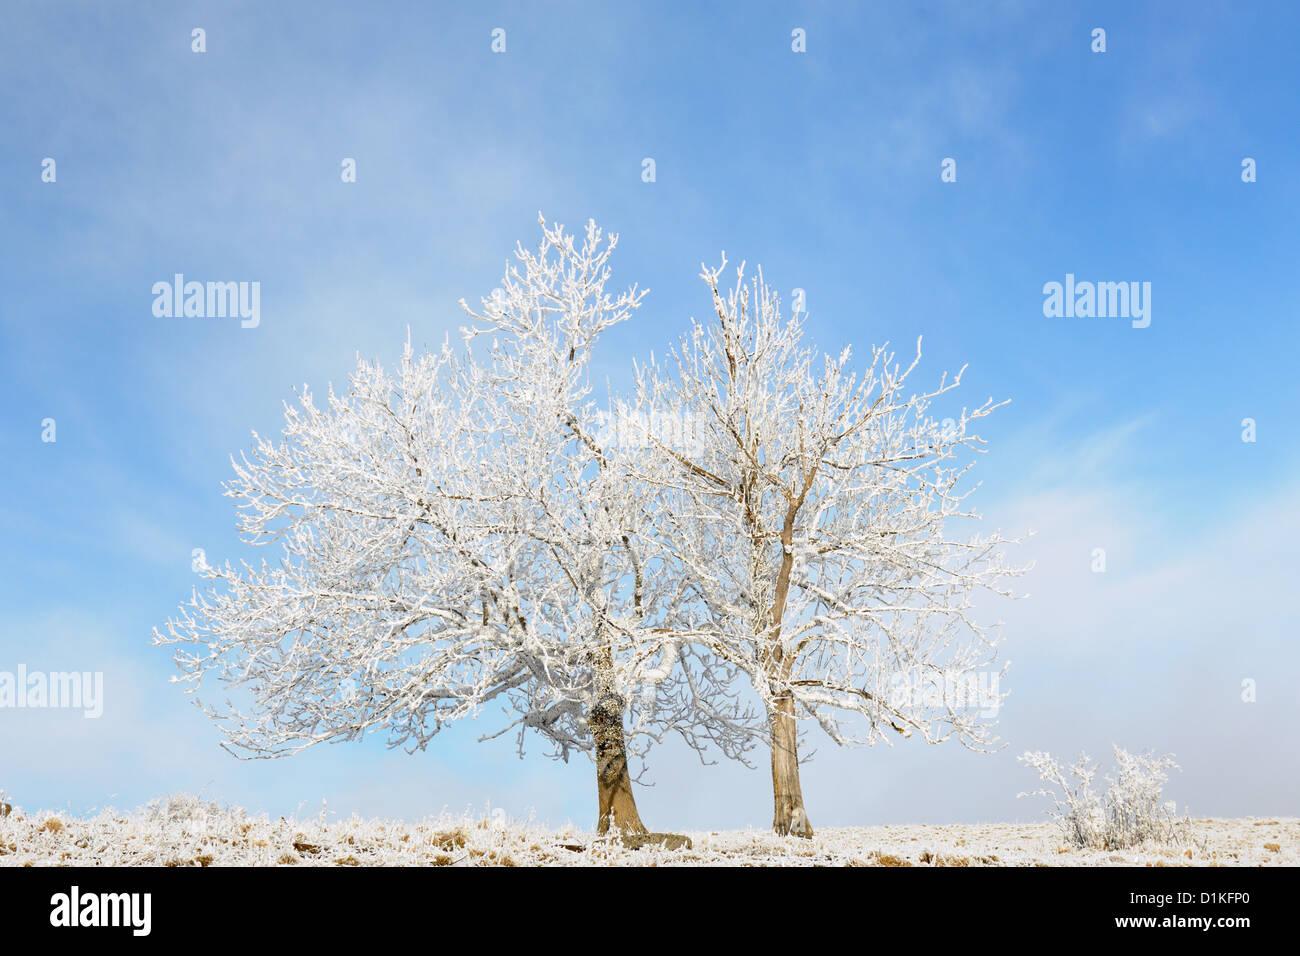 Two frozen trees in winter landscape. - Stock Image